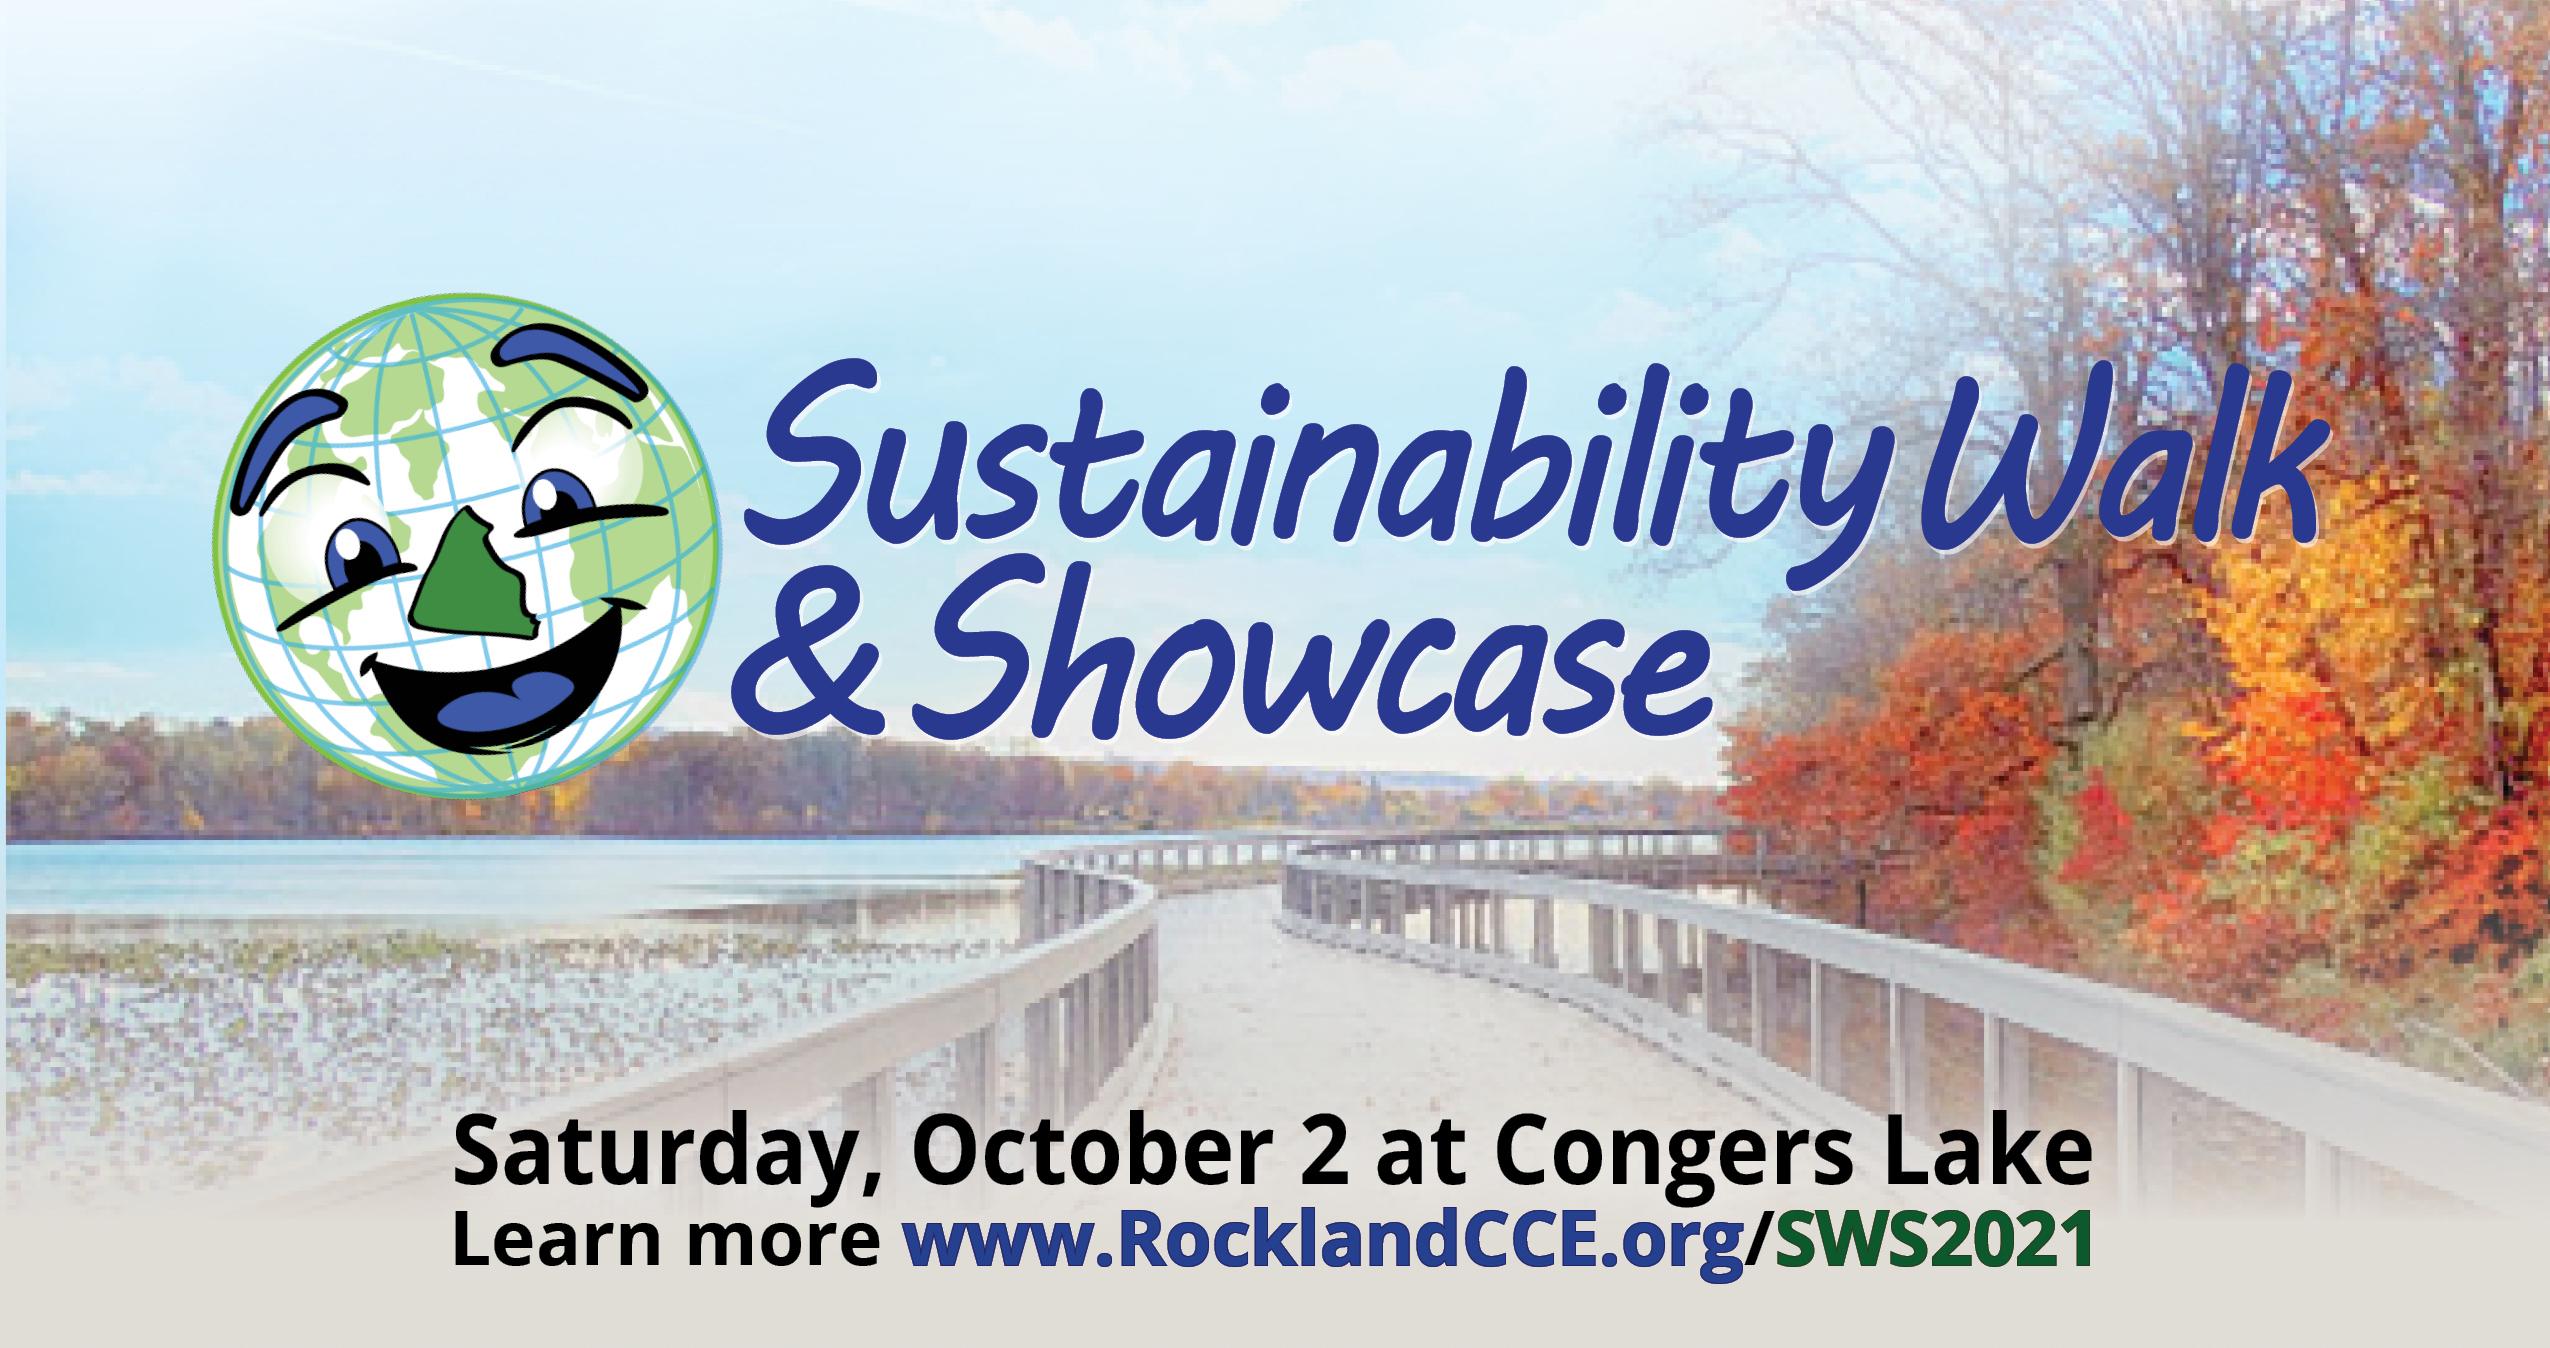 Sustainability Walk and Showcase at Congers Lake